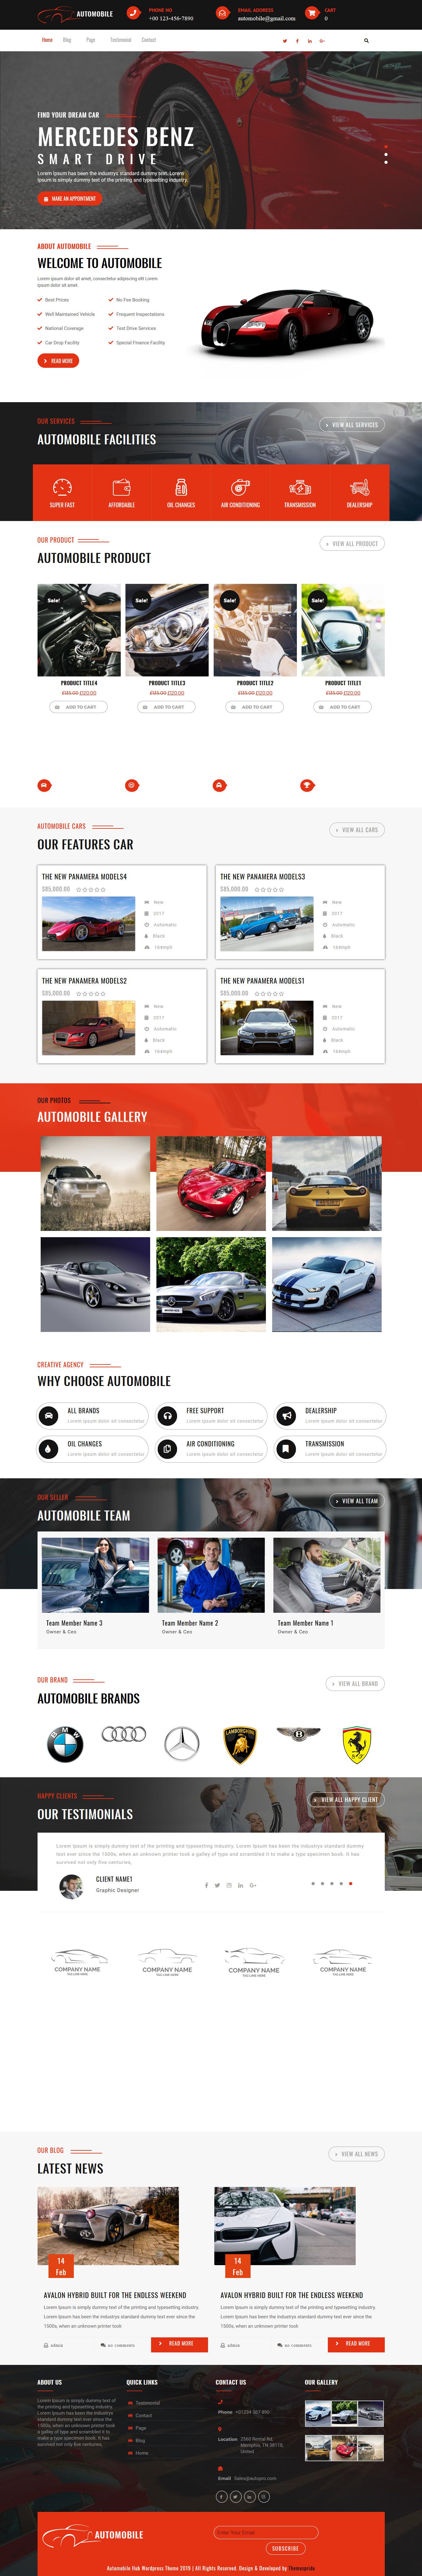 automobile hub best free automobile wordpress theme - 10+ Best Free Automobile WordPress Themes